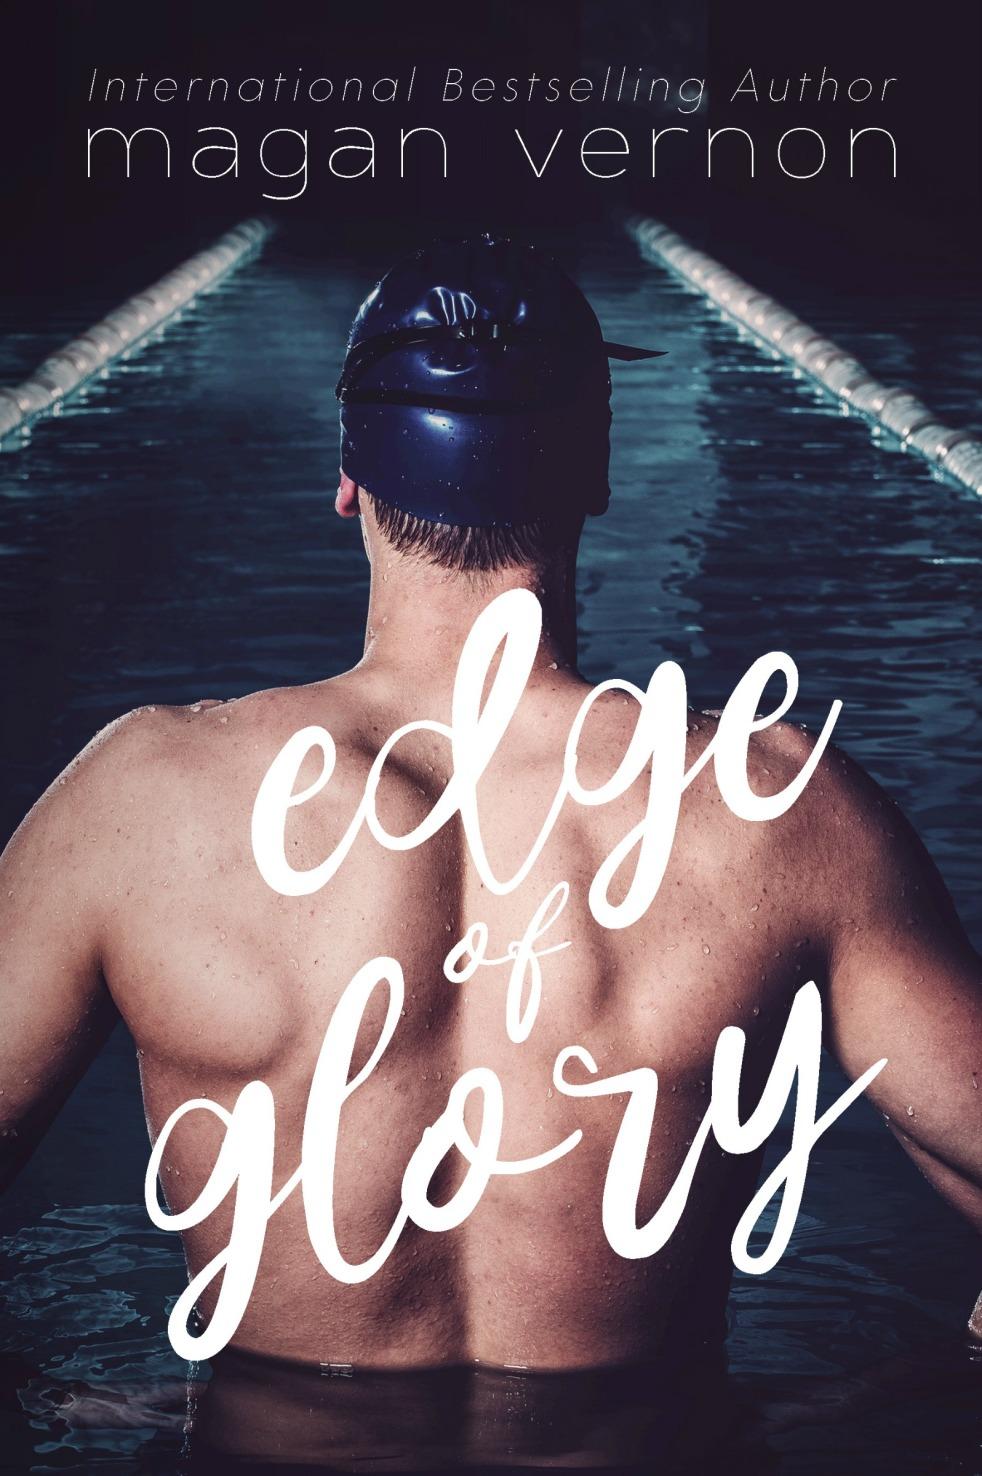 Edge of Glory Ebook Cover